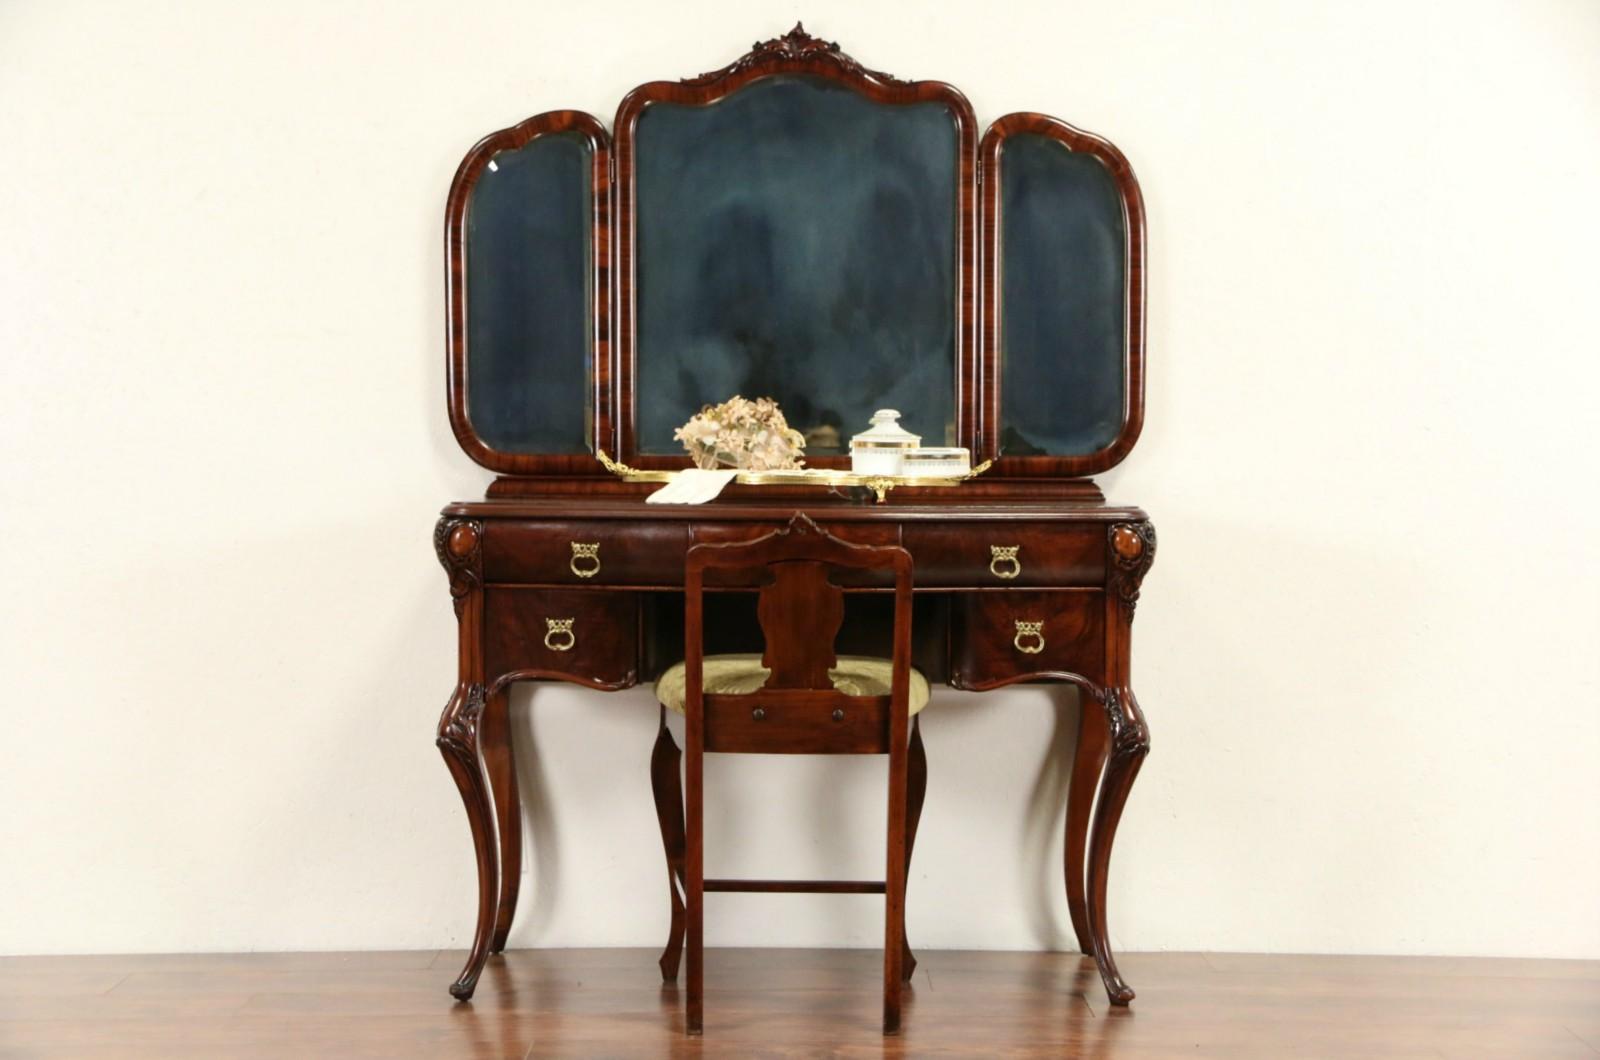 Vanity, Dressing Table Or Desk W/ Mirrors U0026 Chair, 1920u0027s Mahogany By Sligh